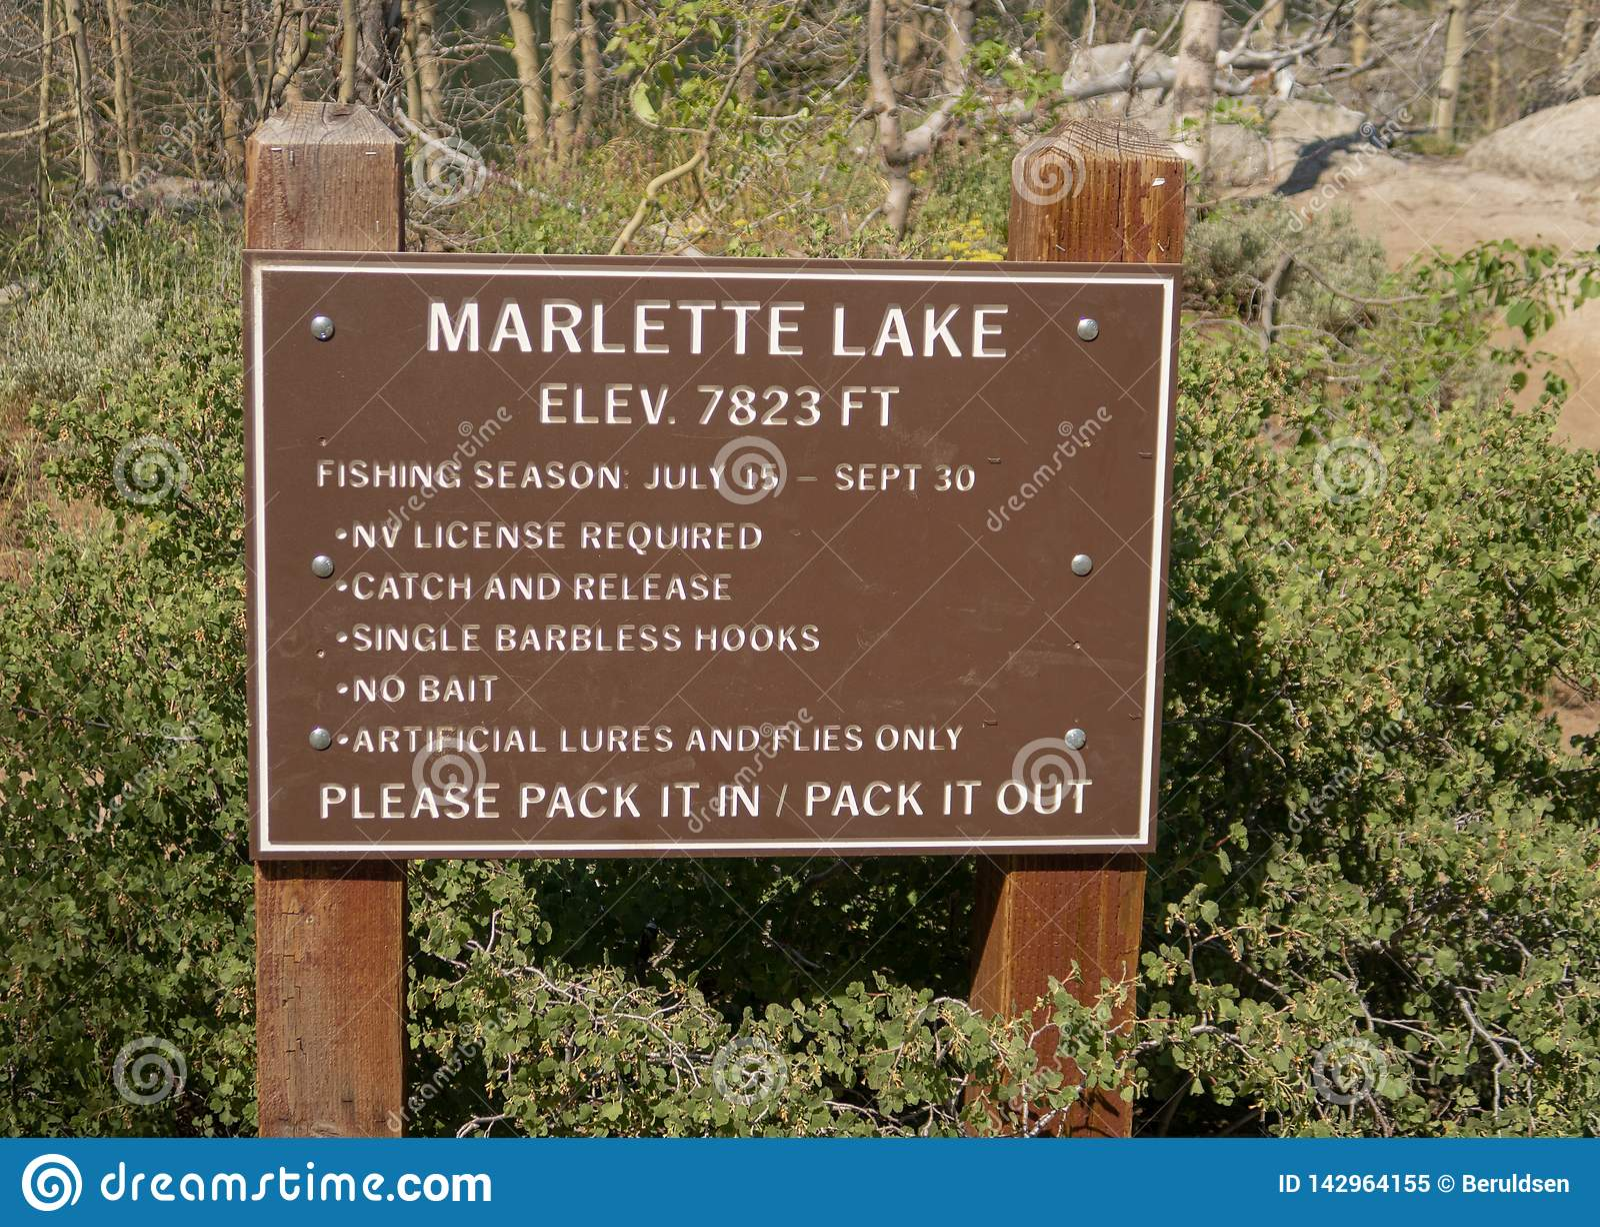 Marlette Lake in Lake Tahoe